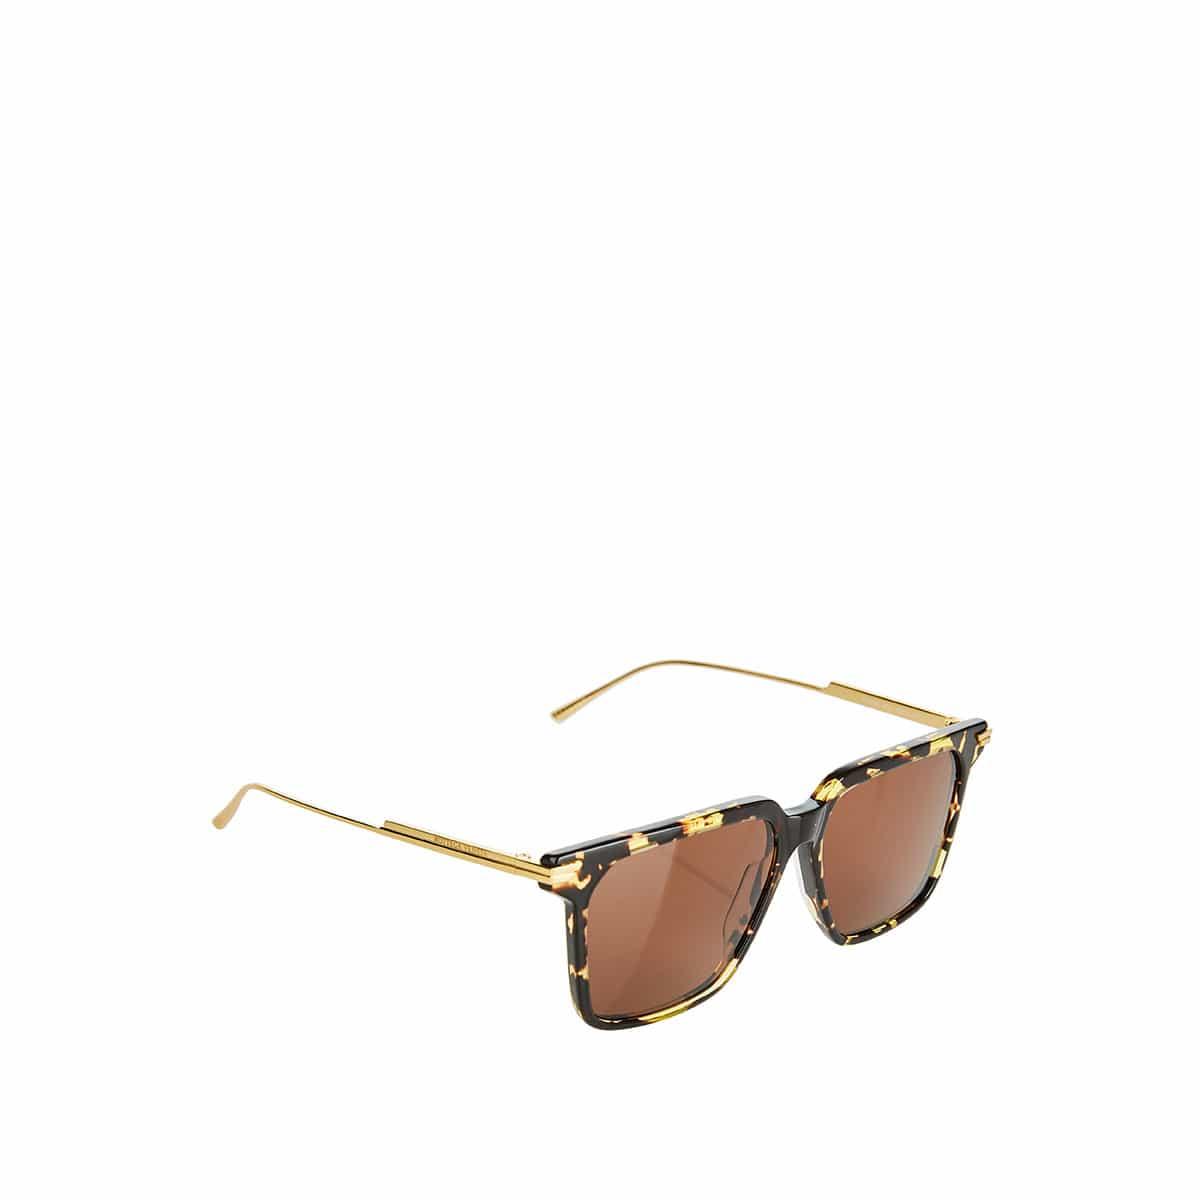 Oversized tortoiseshell square sunglasses